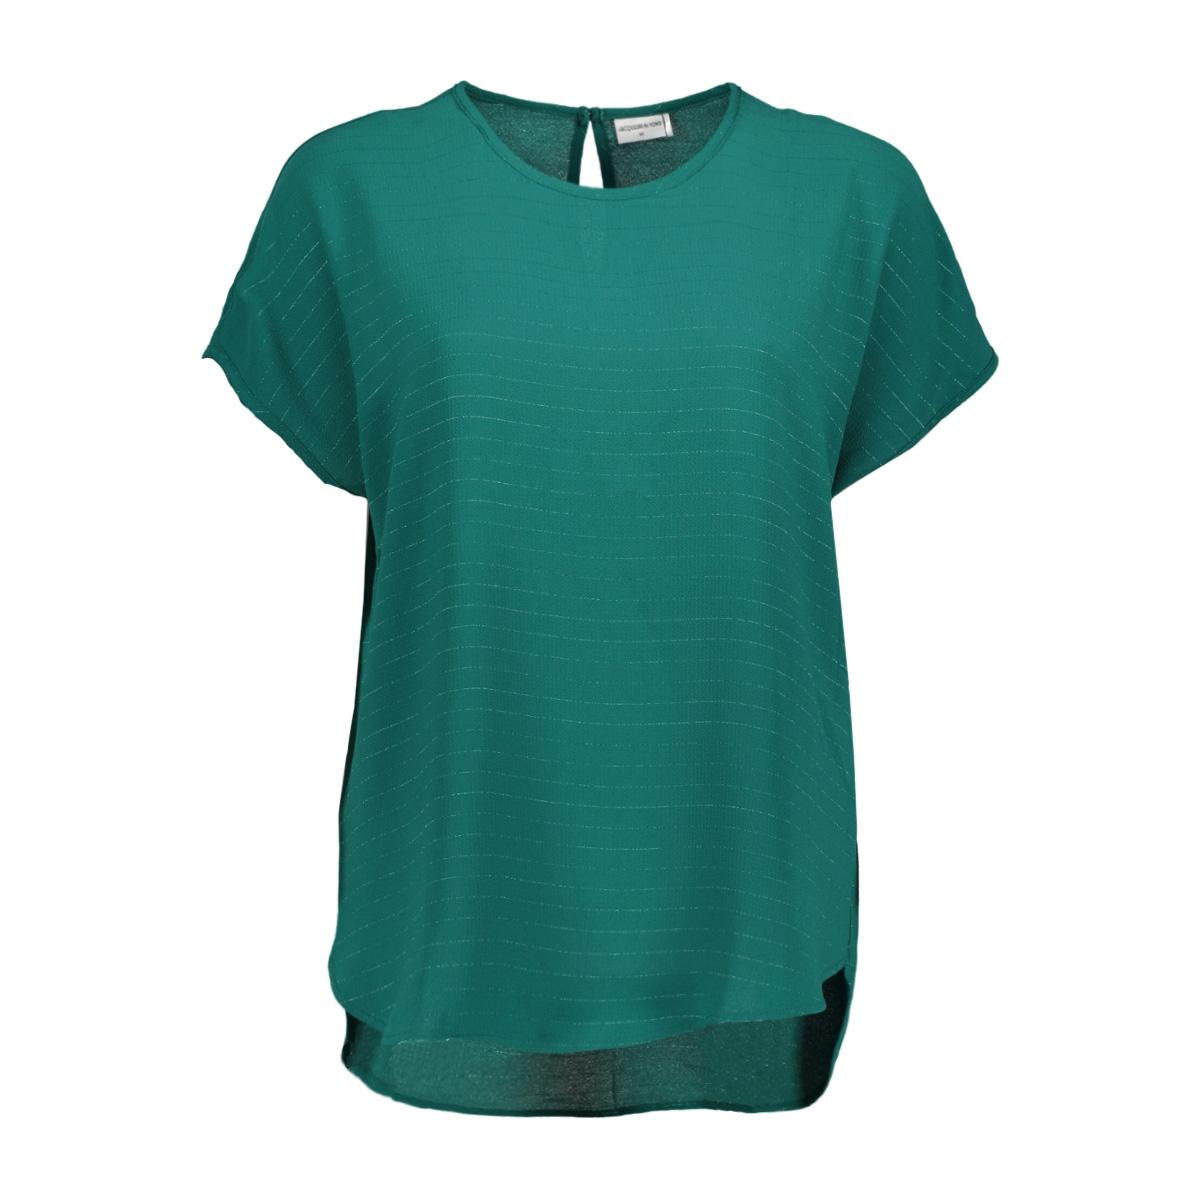 jdyserenity s/s top wvn 15143329 jacqueline de yong t-shirt storm/gunmetall